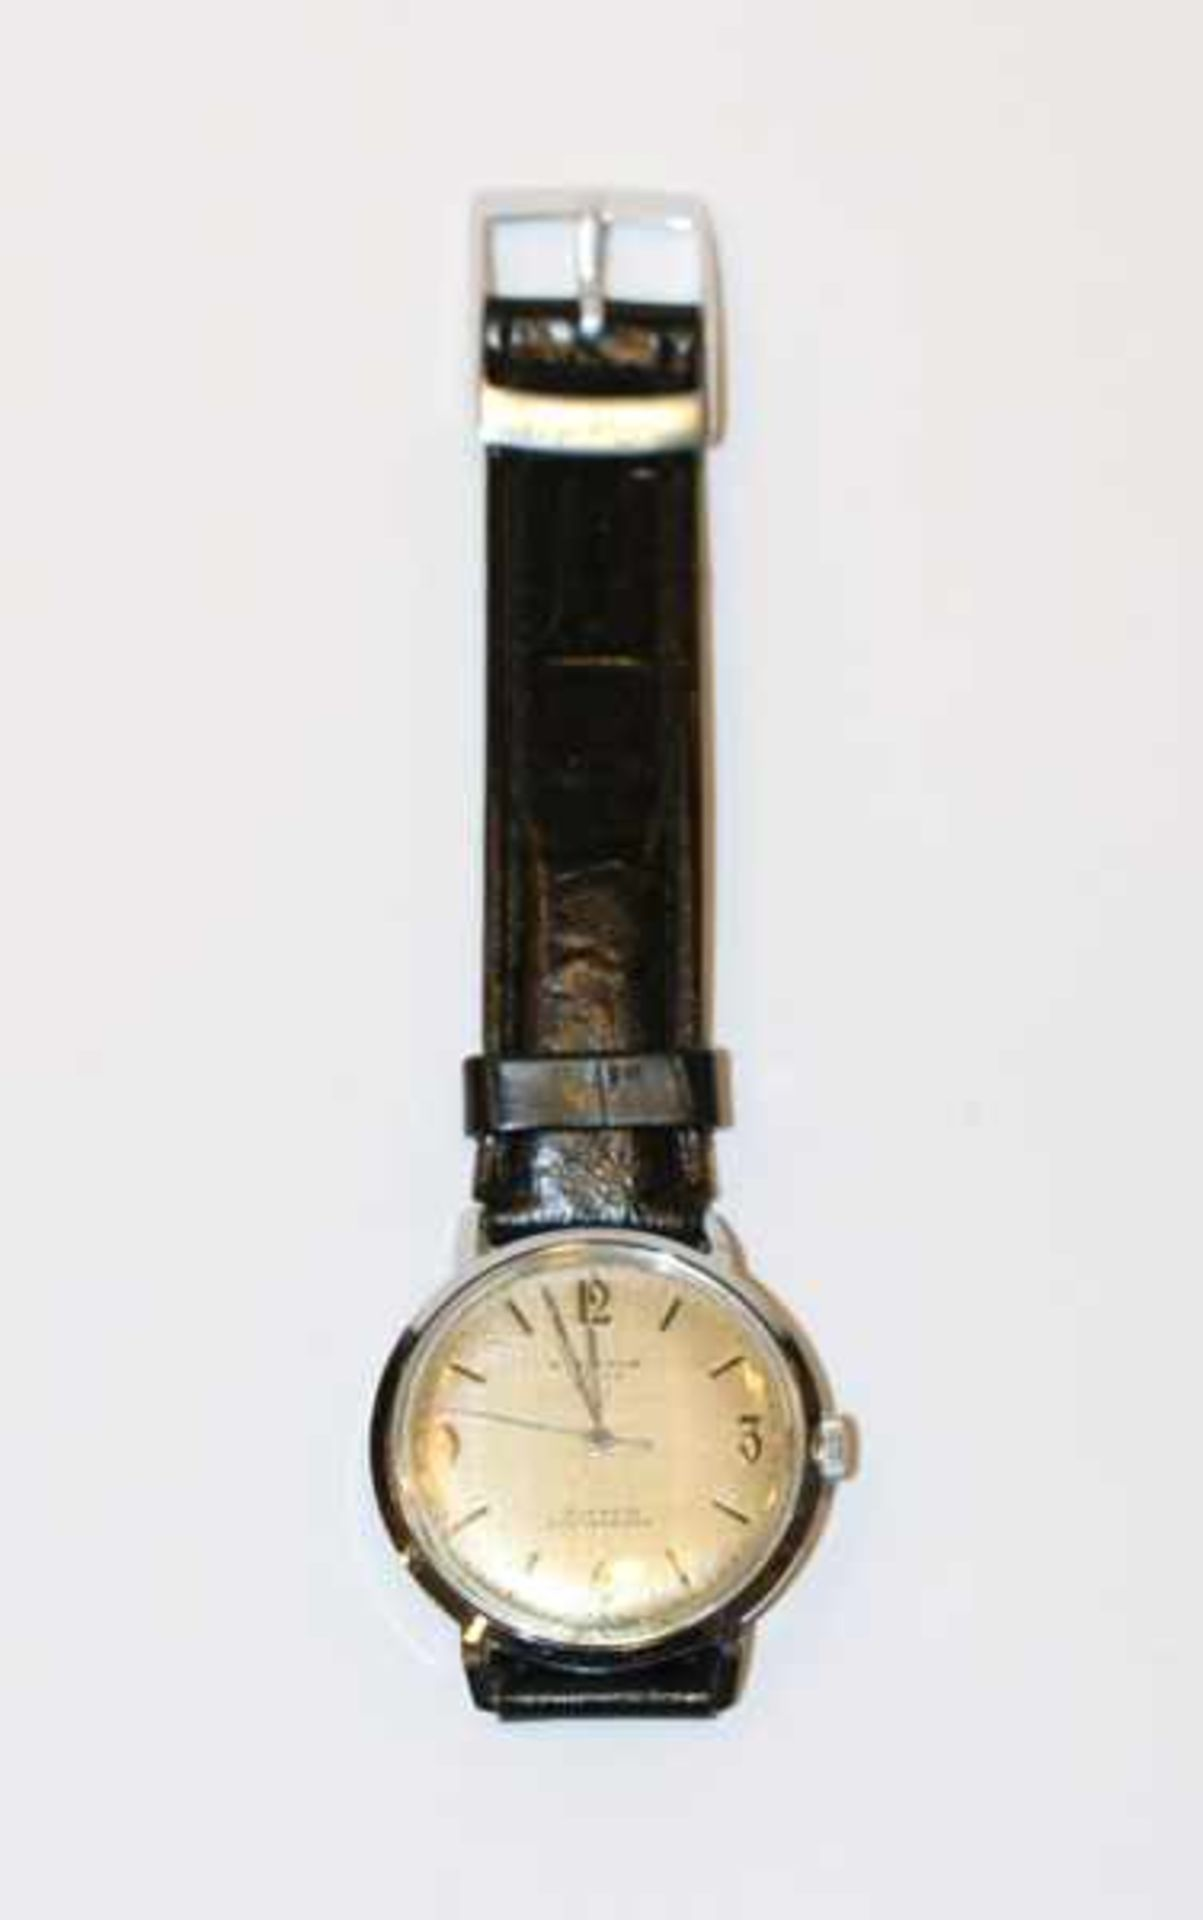 Los 60 - Kienzle Armbanduhr um 1965, intakt, Tragespuren, an neuwertigem, schwarzen Lederarmband